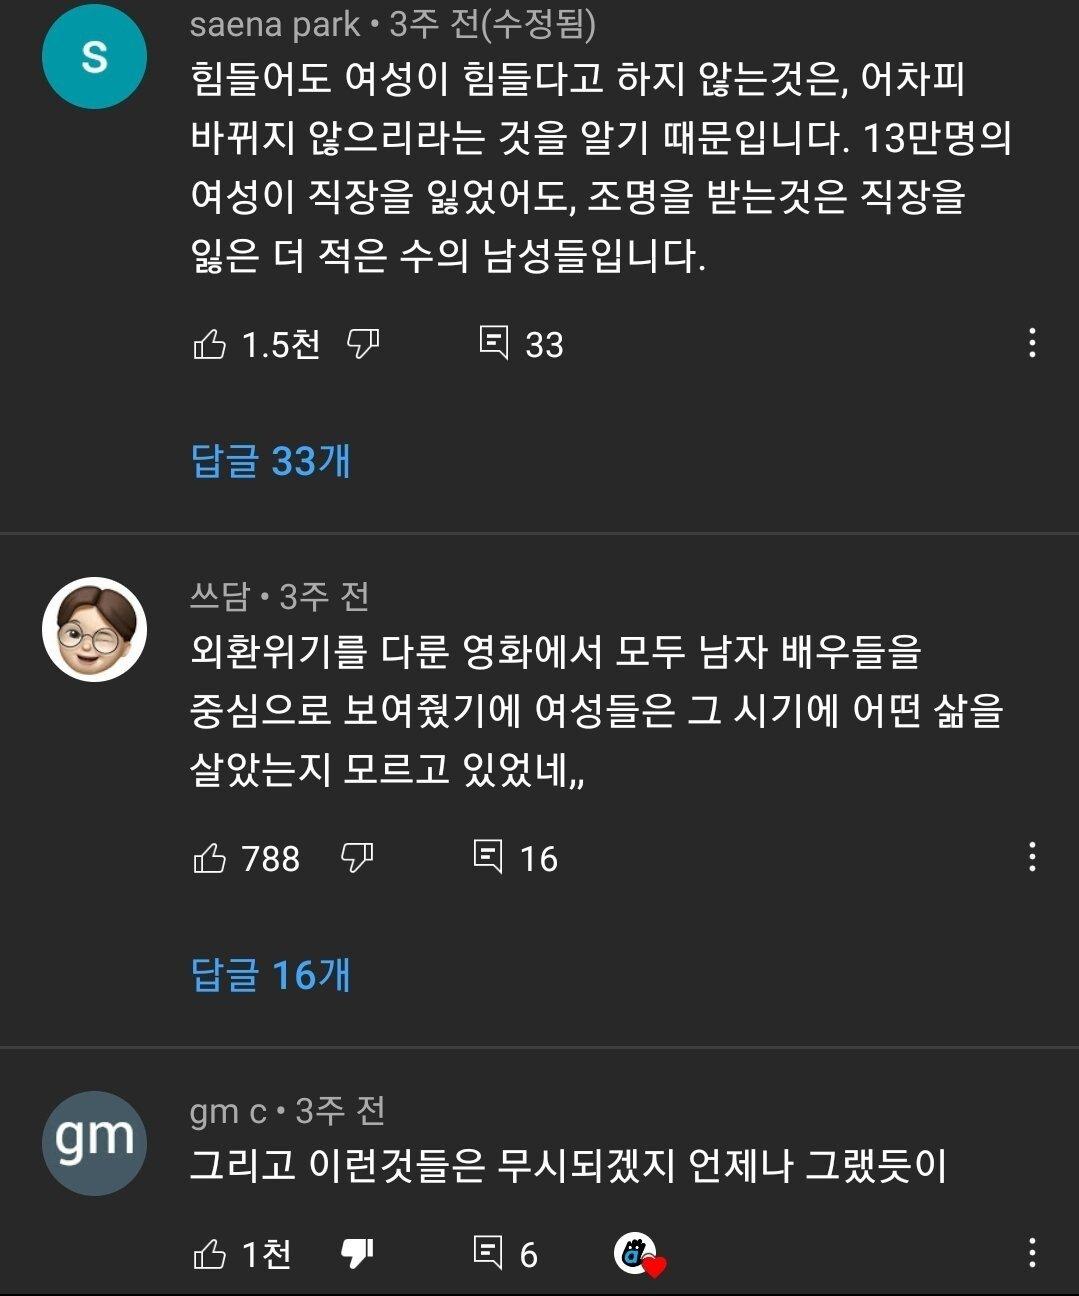 4b0dd894054843fc744a0f9e0282473b_11307156618.jpg [속보] 한국여자들 자사율 급증 jpg